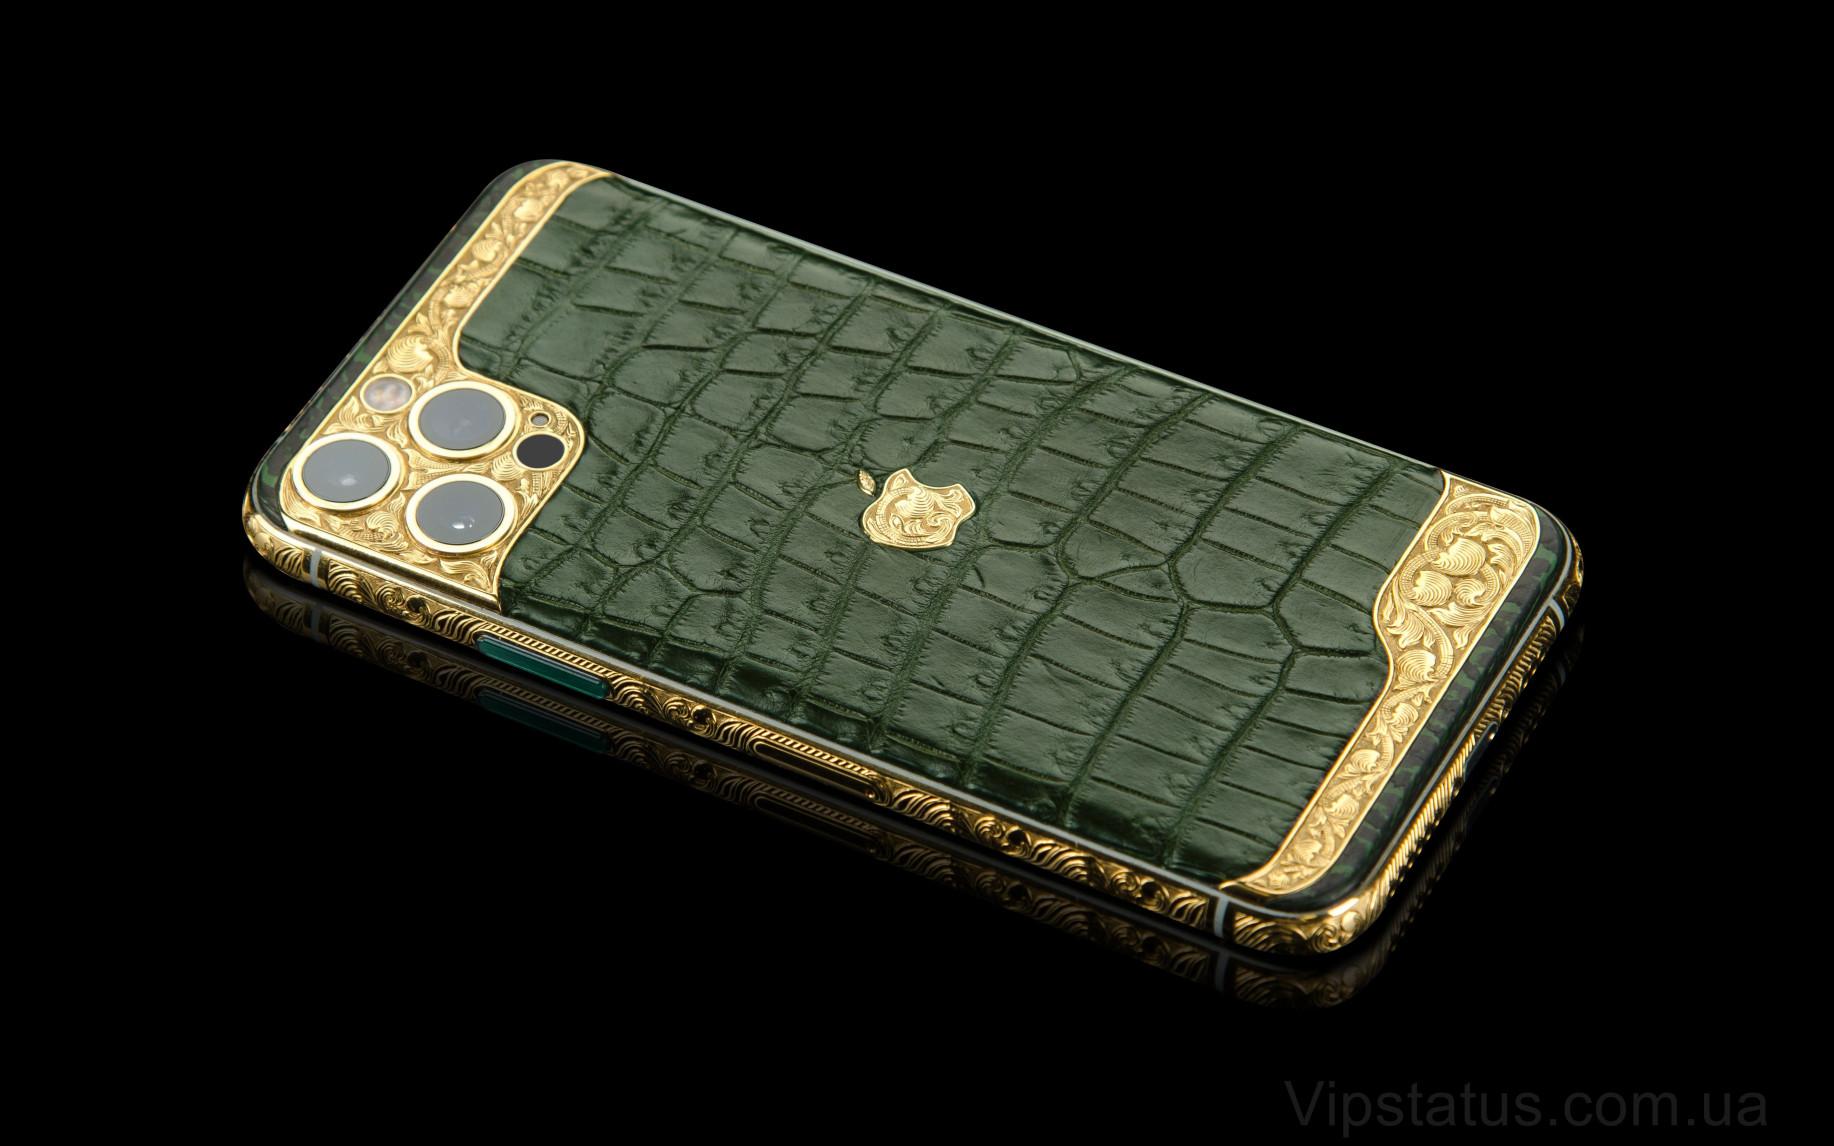 Elite Eastern Emerald IPHONE 12 PRO MAX 512 GB Eastern Emerald IPHONE 12 PRO MAX 512 GB image 3